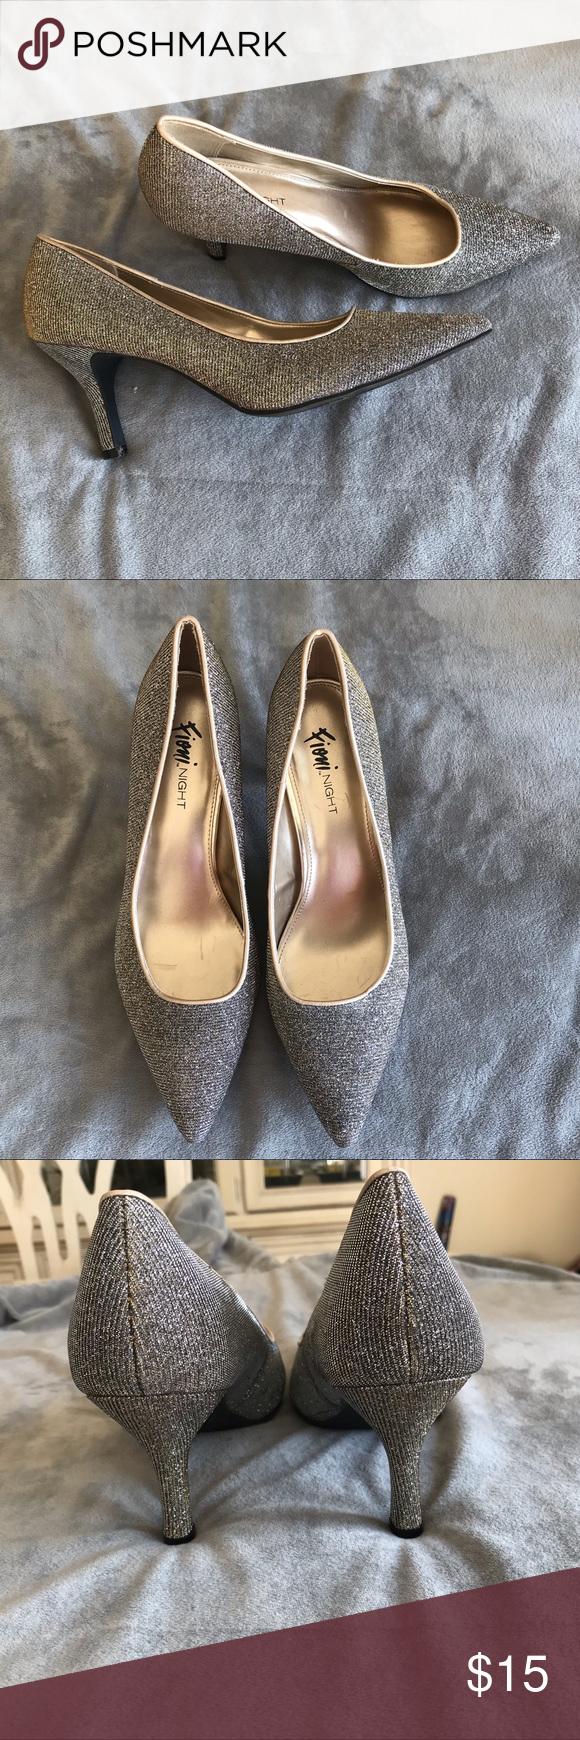 Fioni Night Sparkly Glittery Heels Size